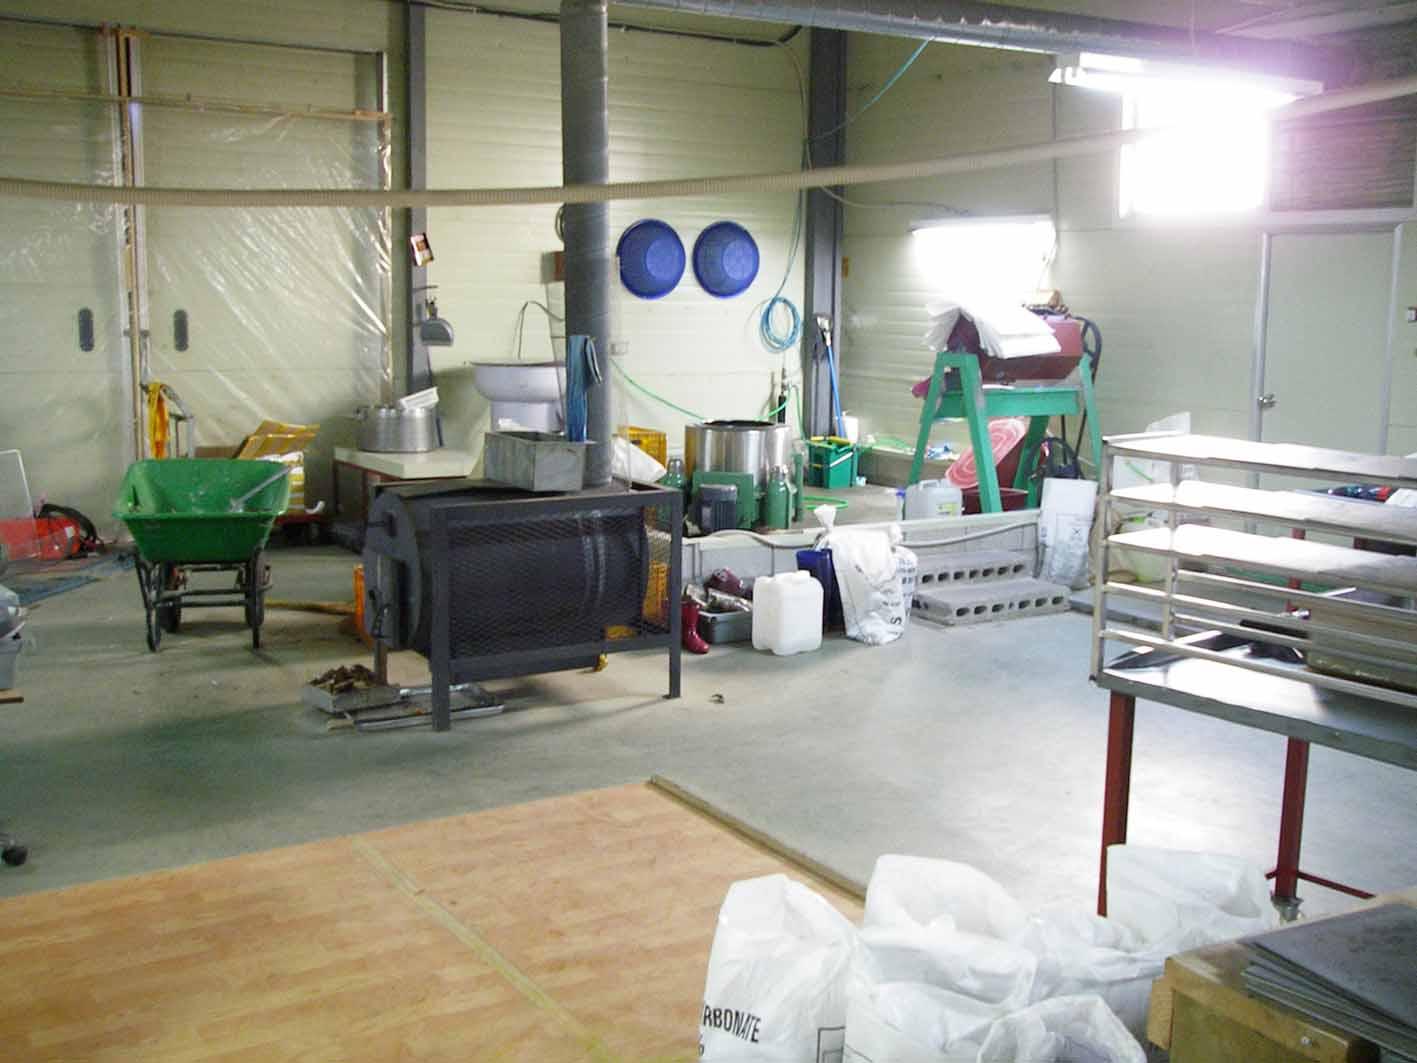 factory image 5.jpg